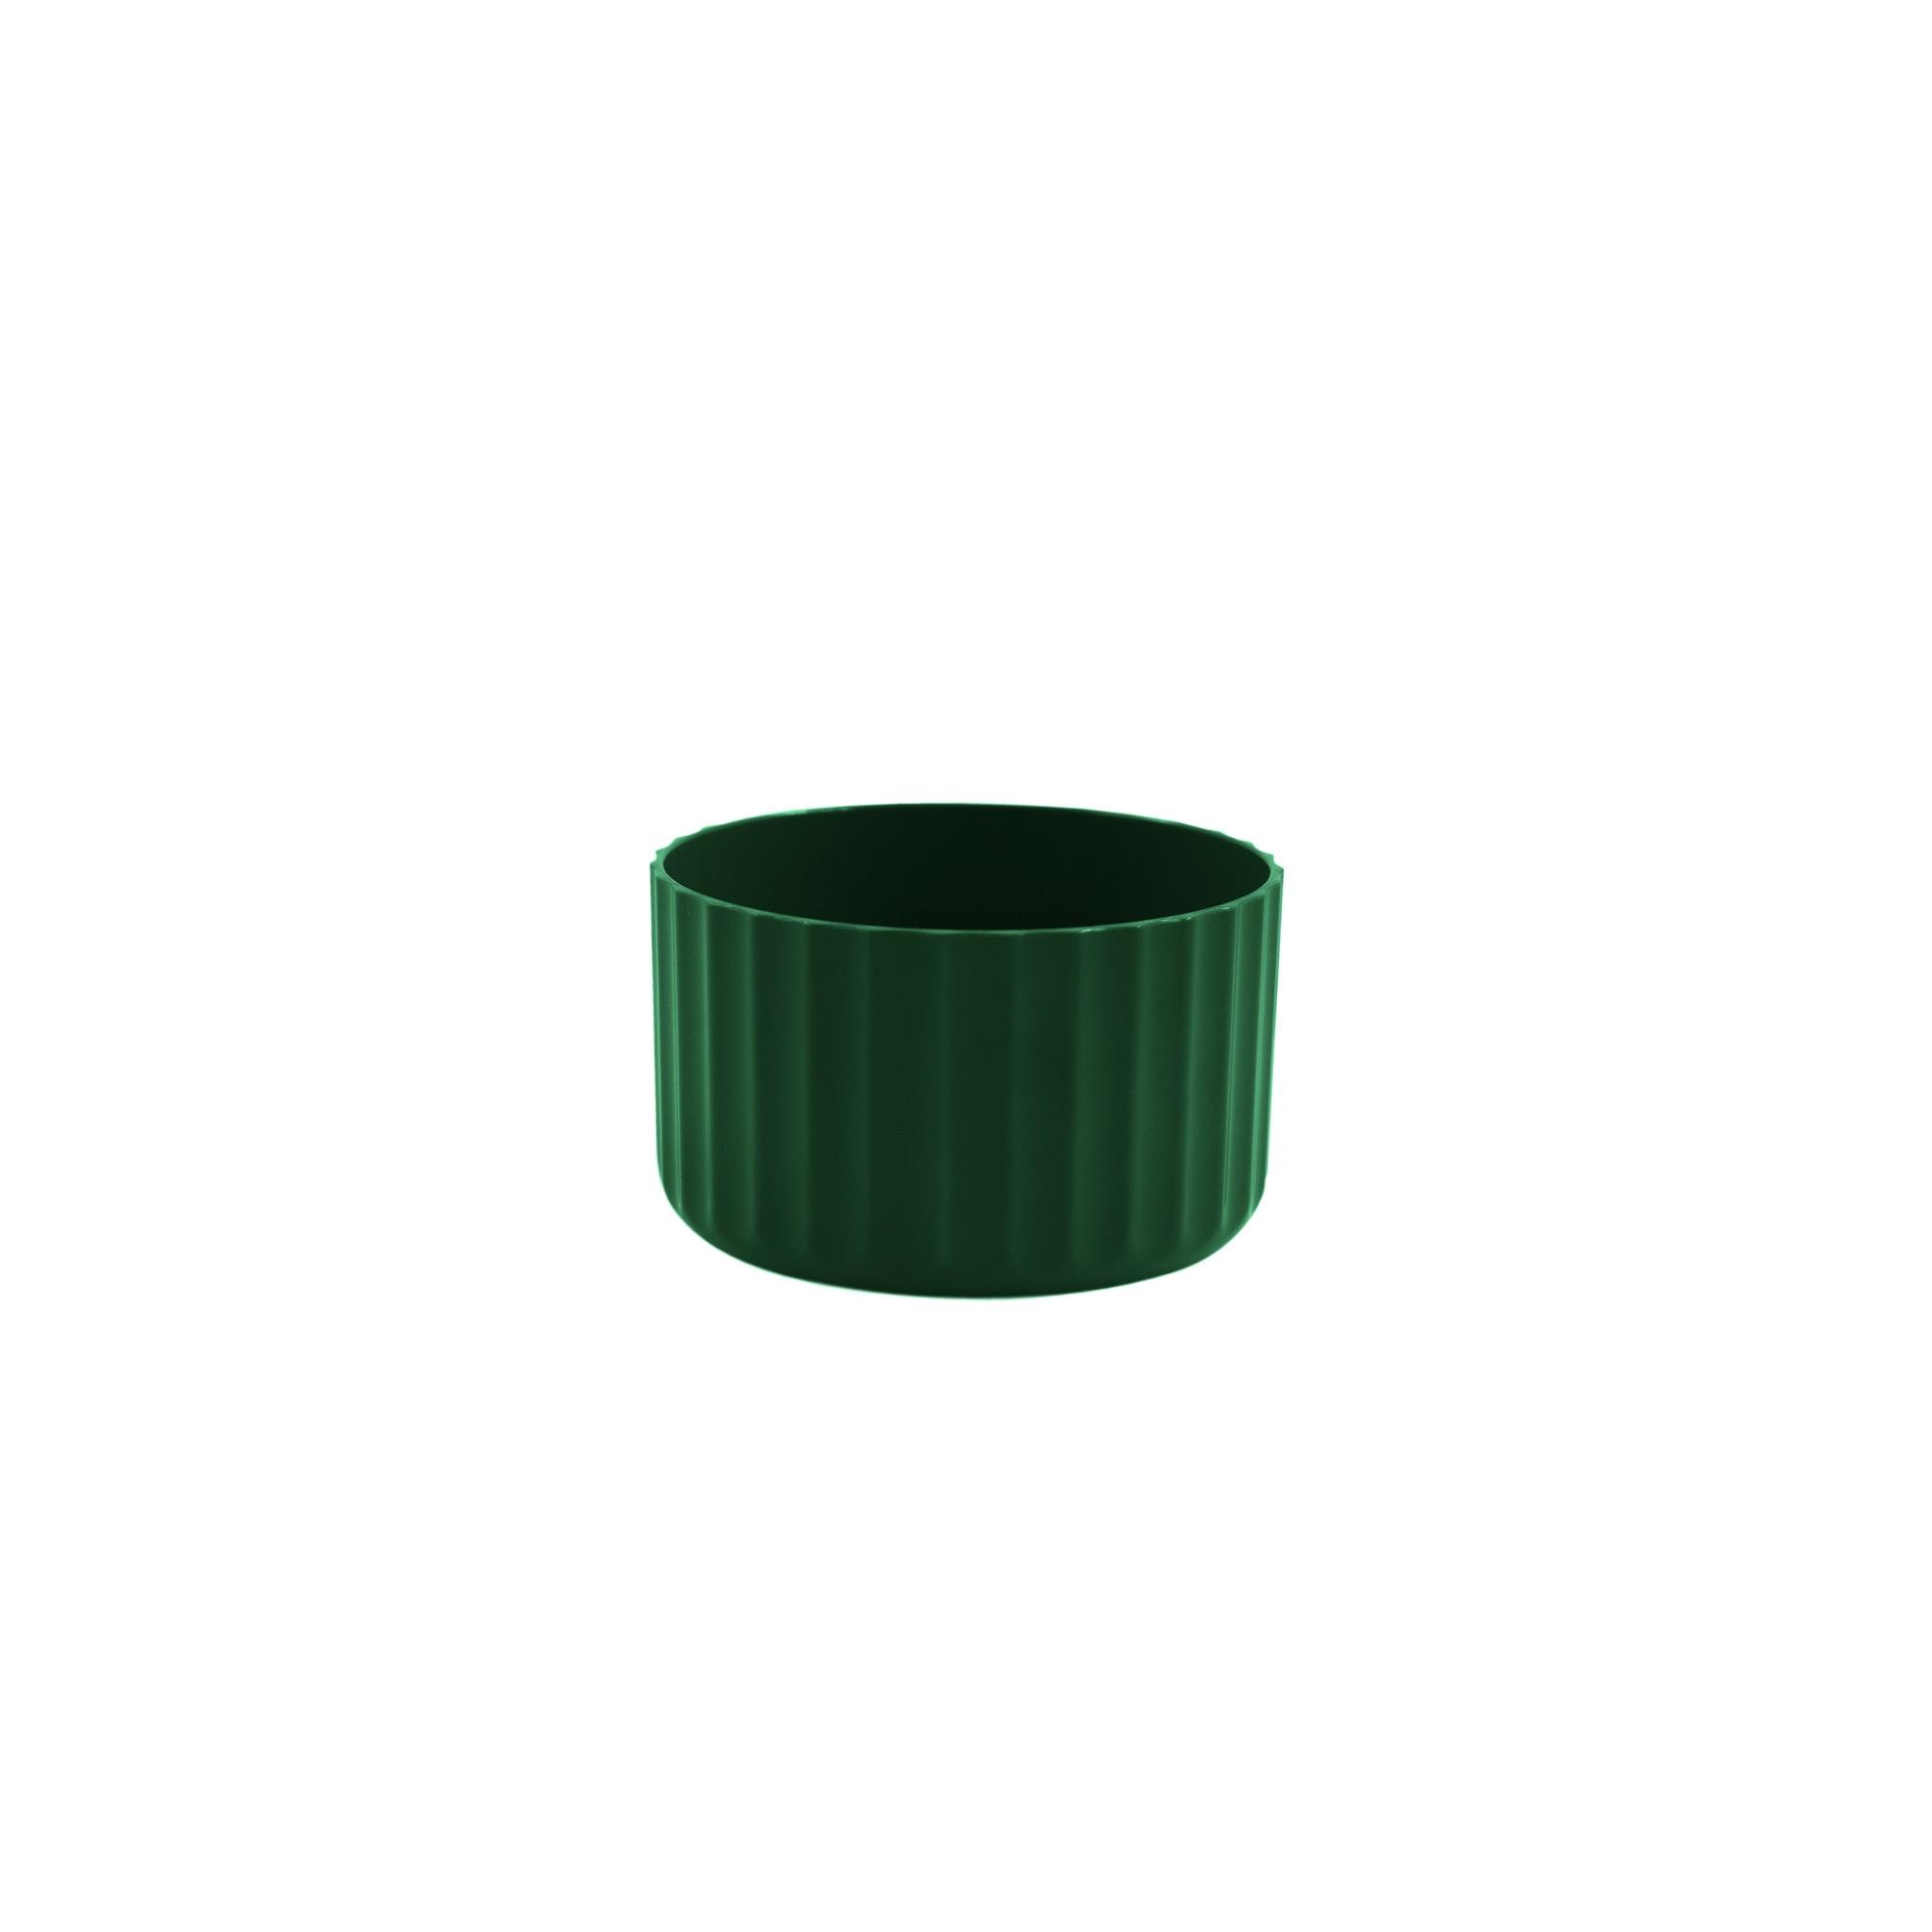 Vaso para Plantas Plastico 6x996 cm Groove Mini Verde botanico - Ou